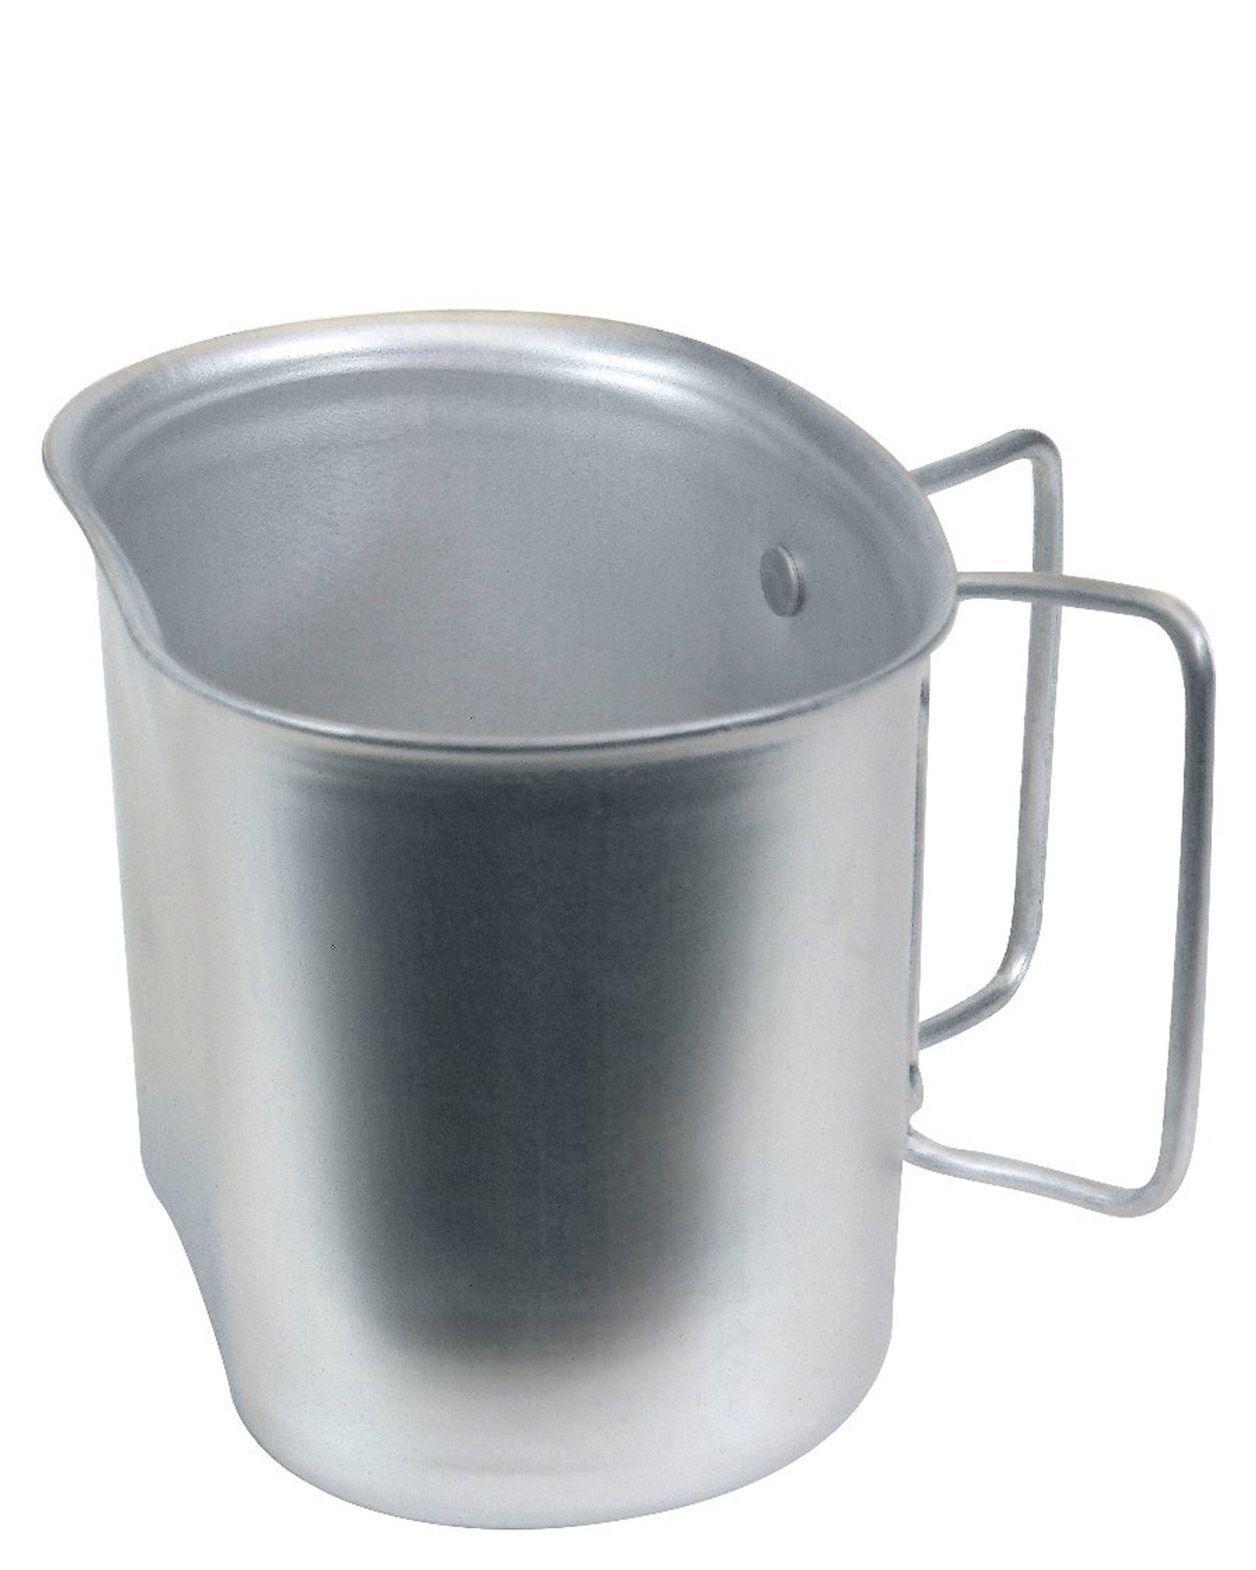 Image of   Rothco Canteen Kop - Aluminum (Aluminium, One Size)